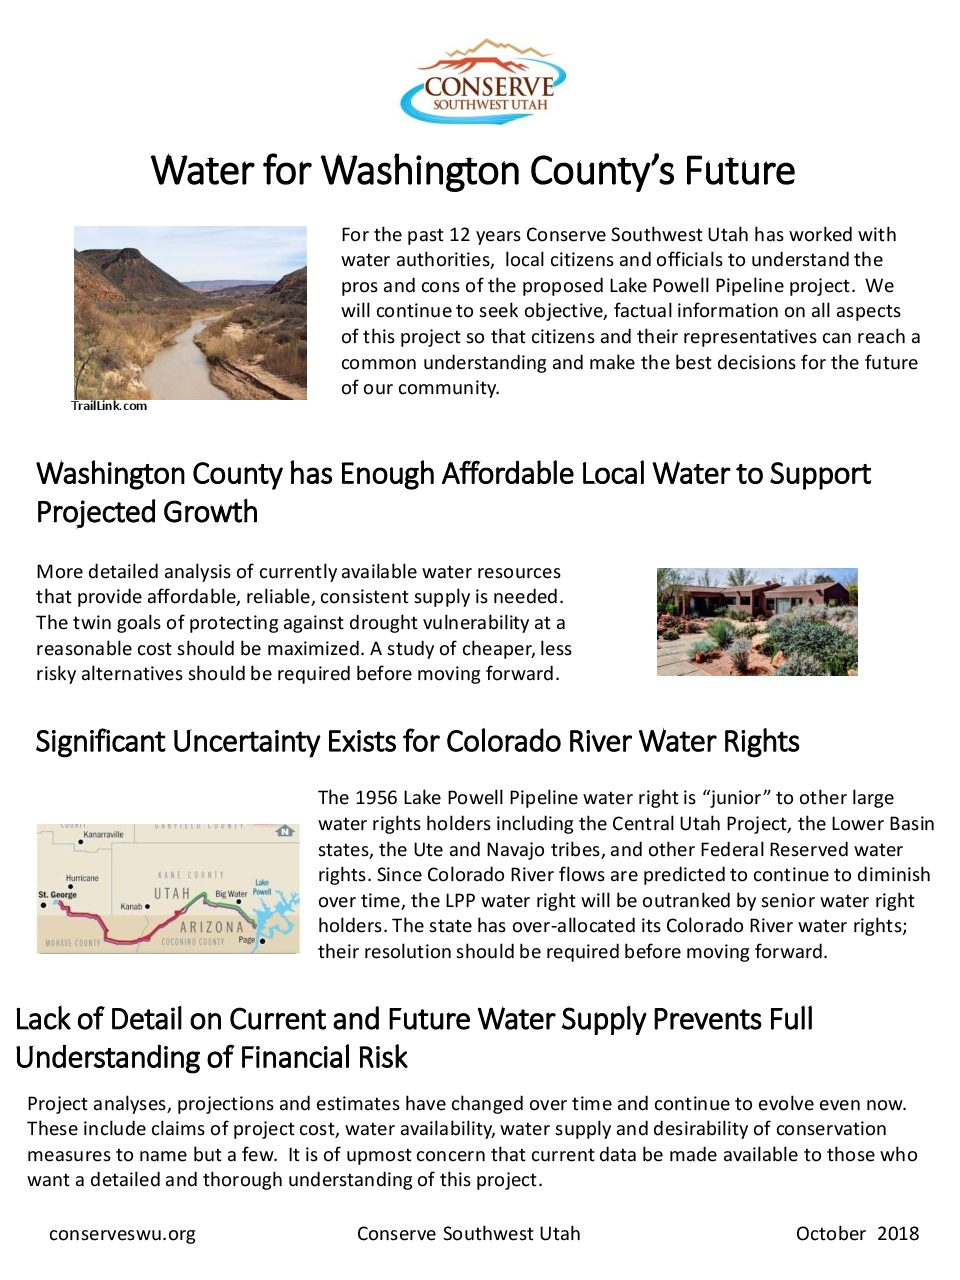 Water for Washington County's Future PDF - Conserveswu